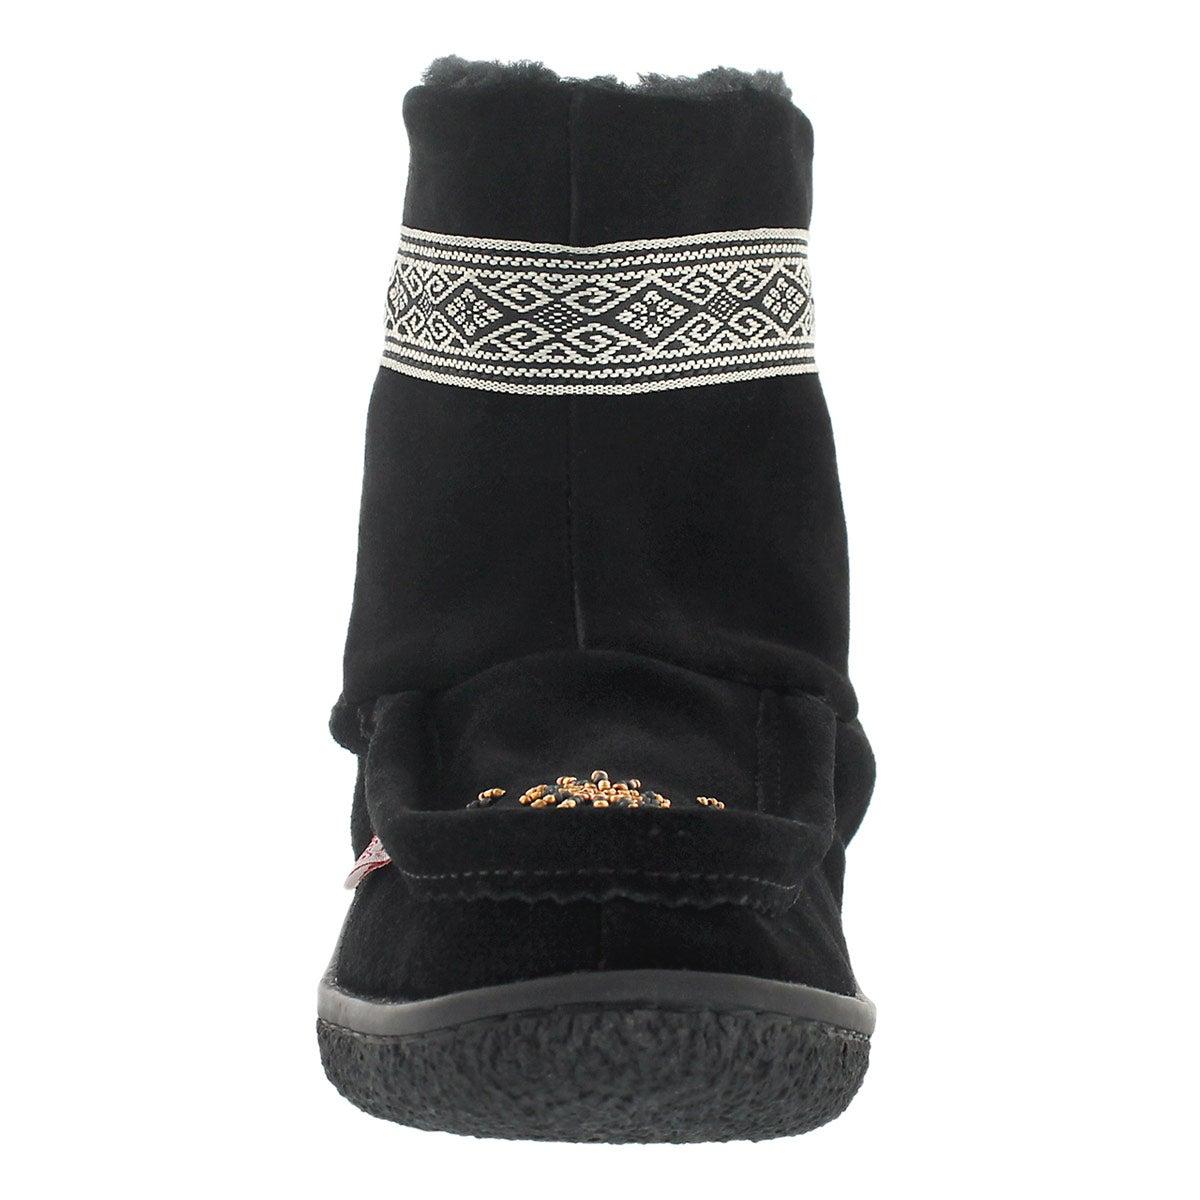 Lds black braid detail mini mukluk